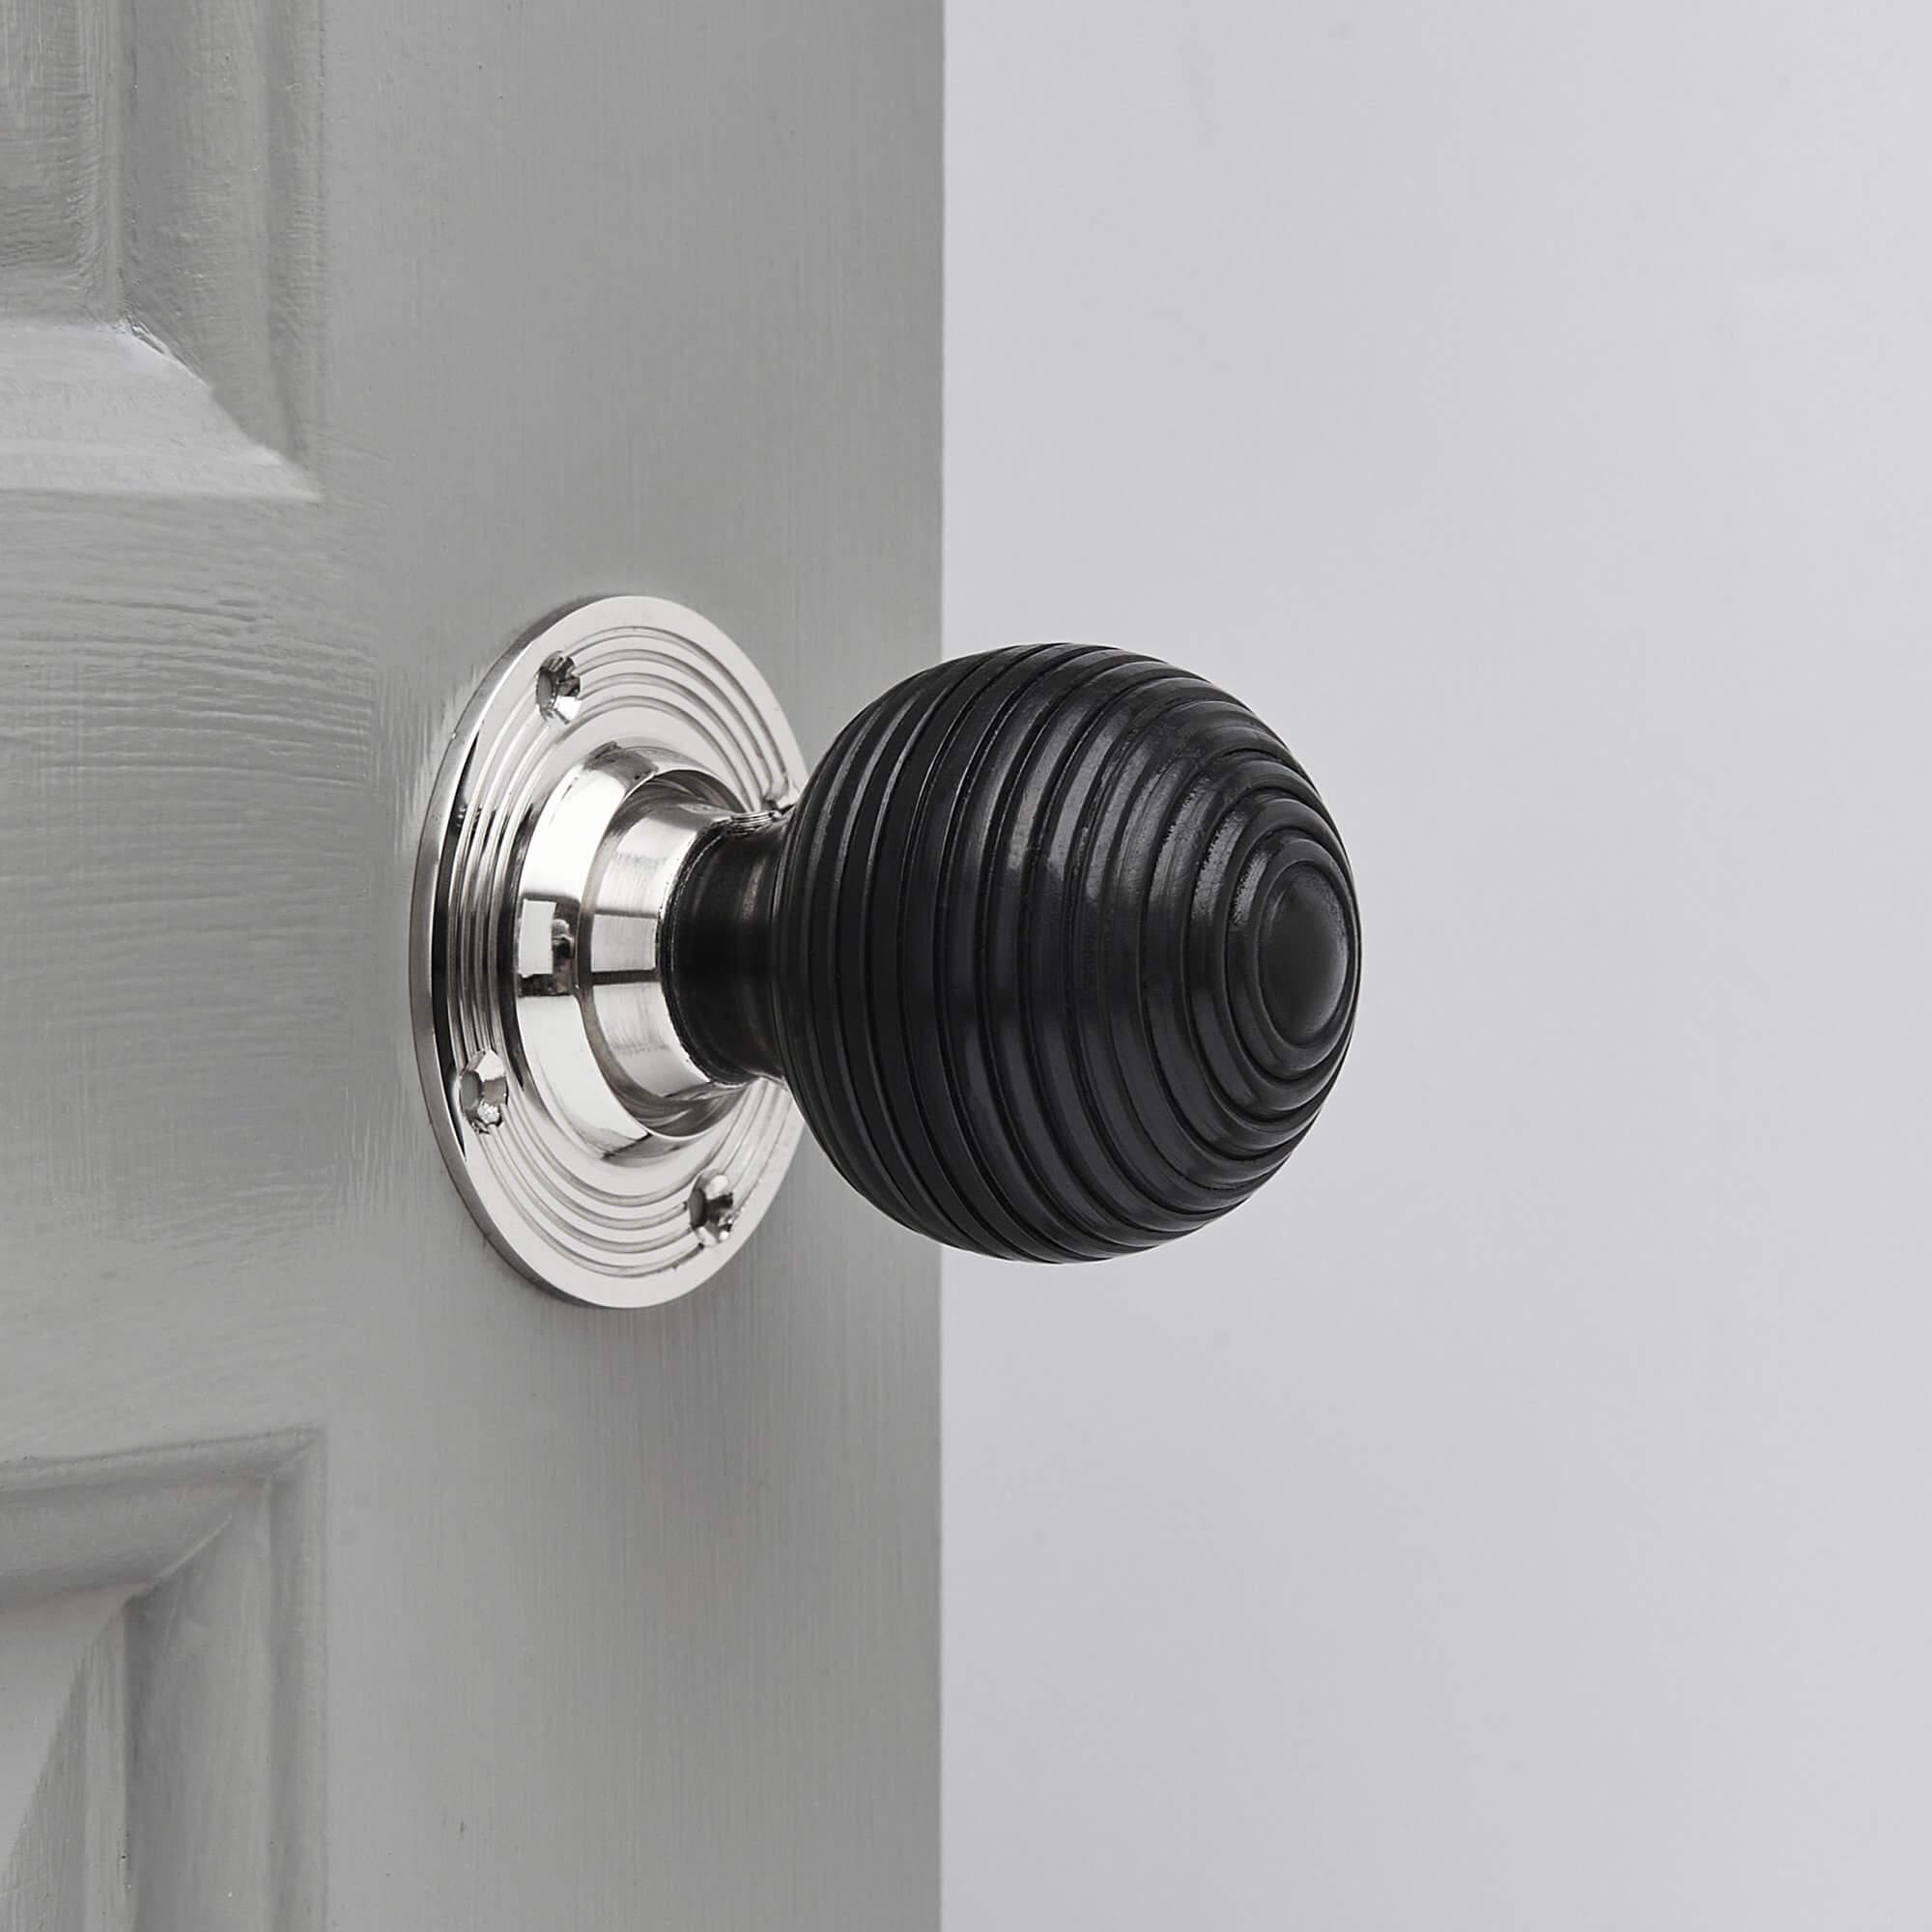 Ebony Wood Beehive Door Knobs (Pair) - Chrome Collar & Rose